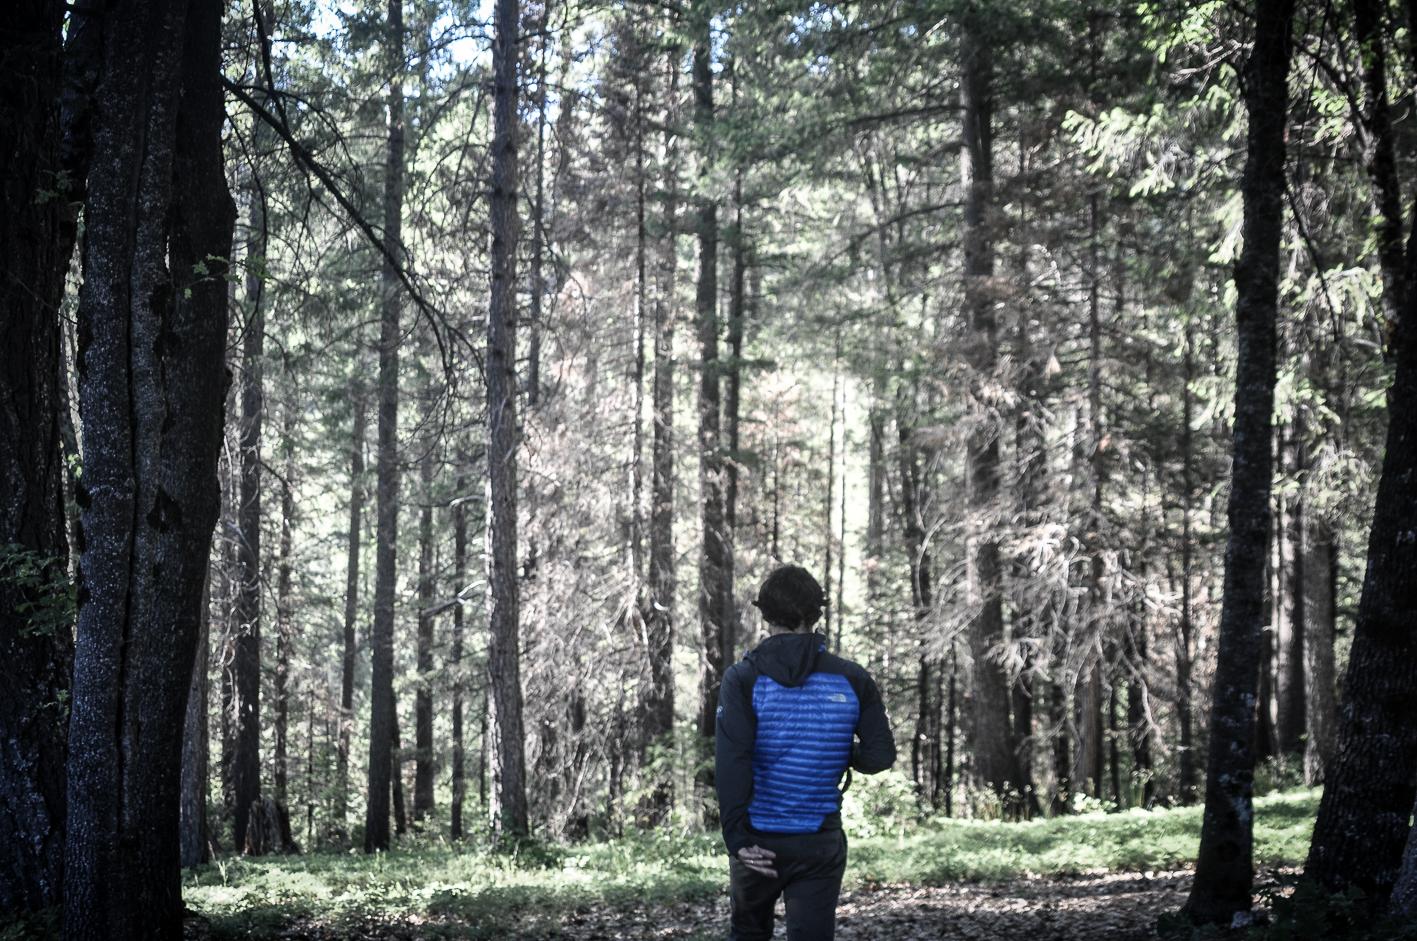 Juliano entrando nas florestas do Yosemite pela primeira vez.